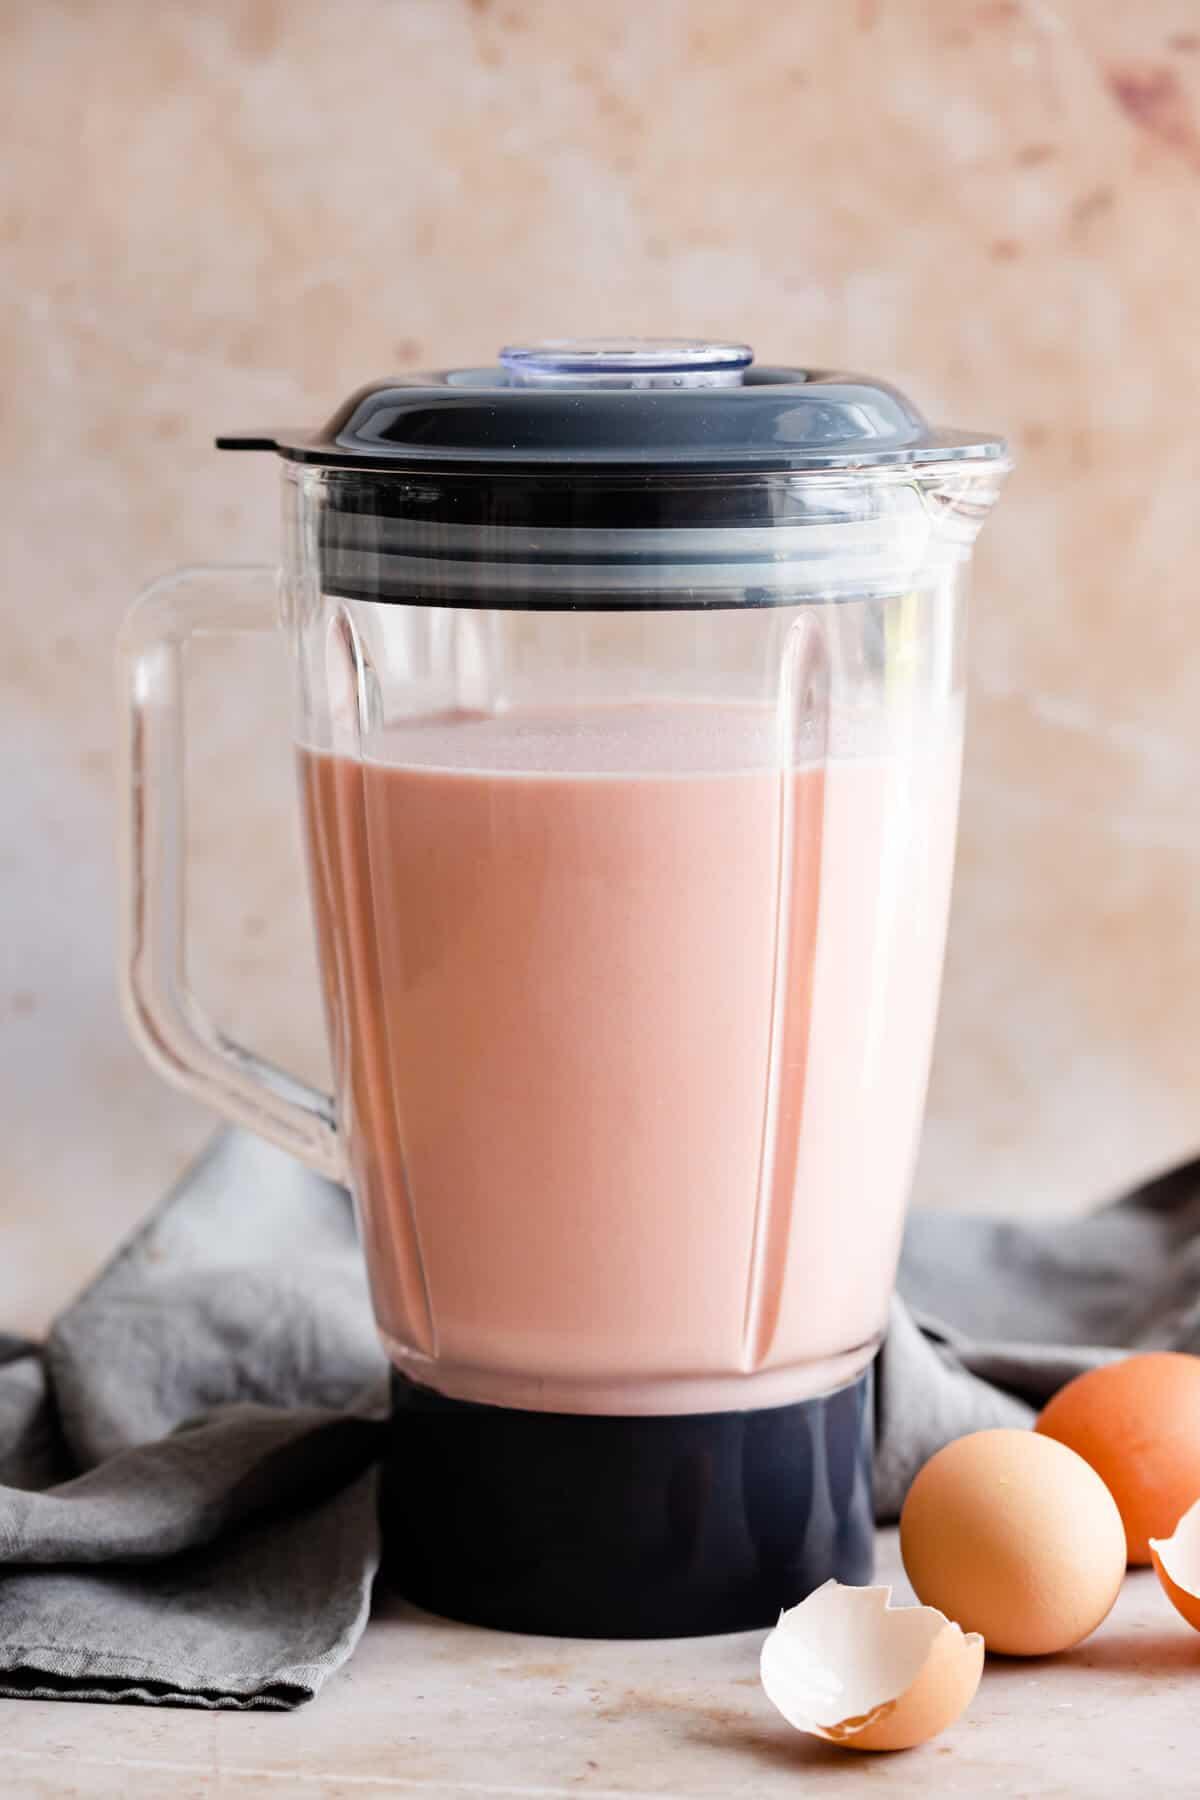 straight ahead shot of a blender jar filled with pink crepe batter